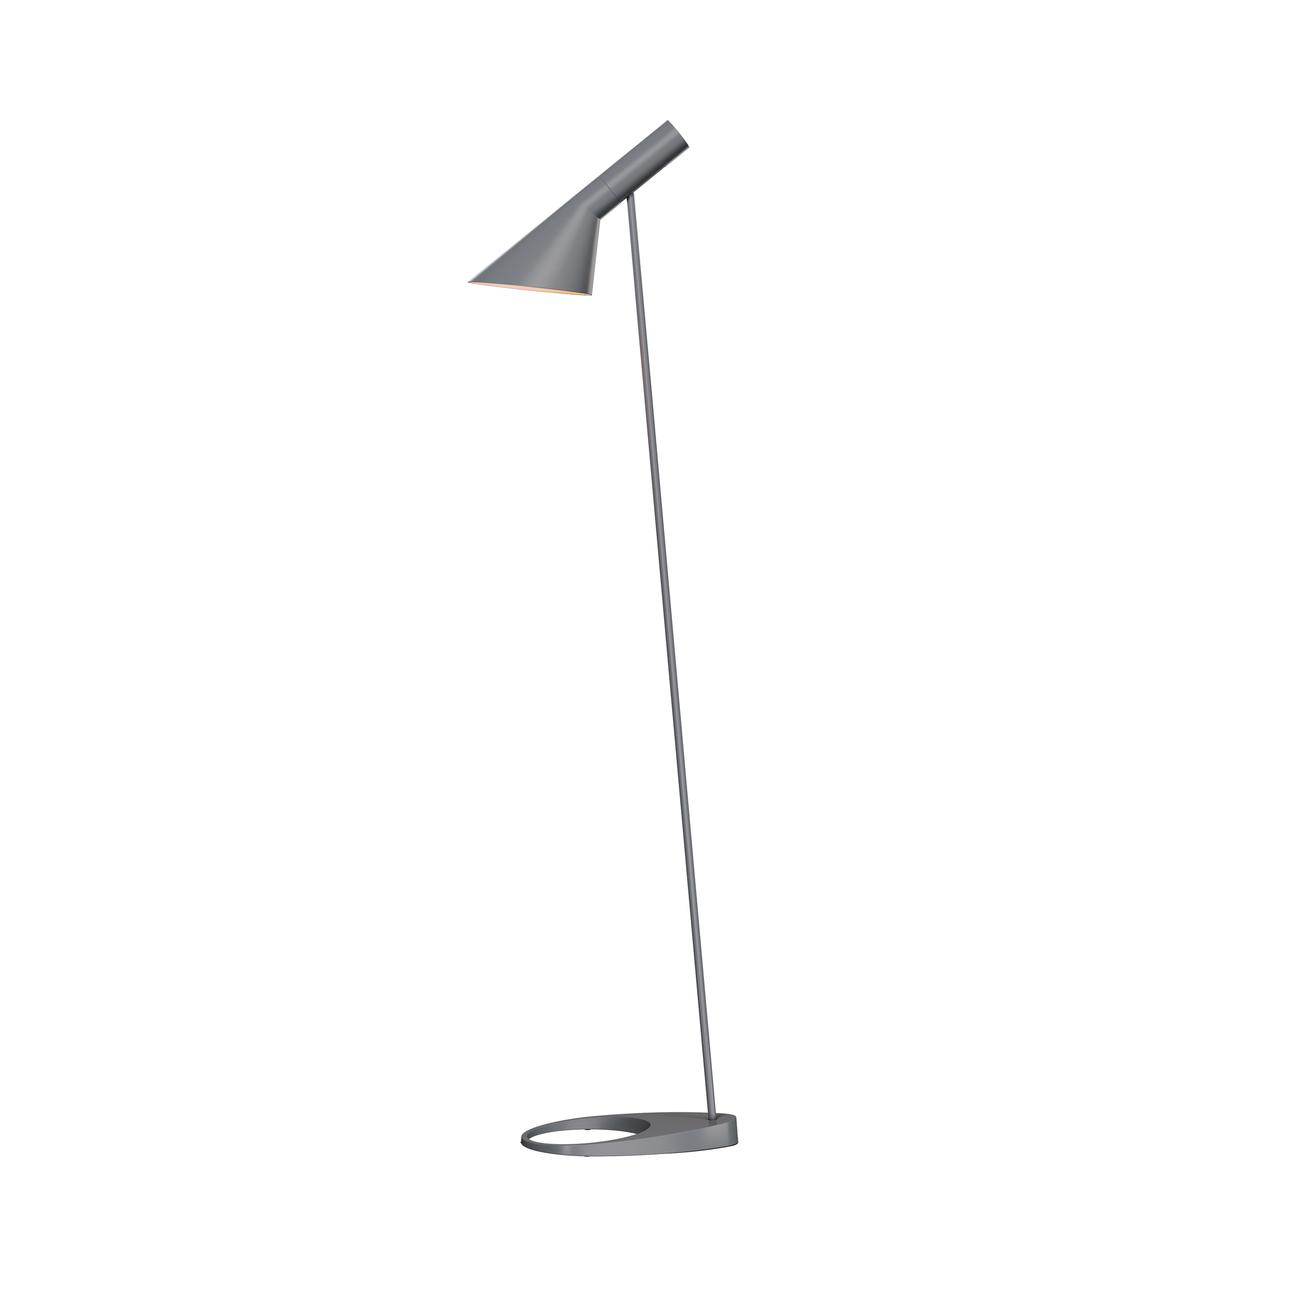 Louis Poulsen AJ vloerlamp-Donker grijs